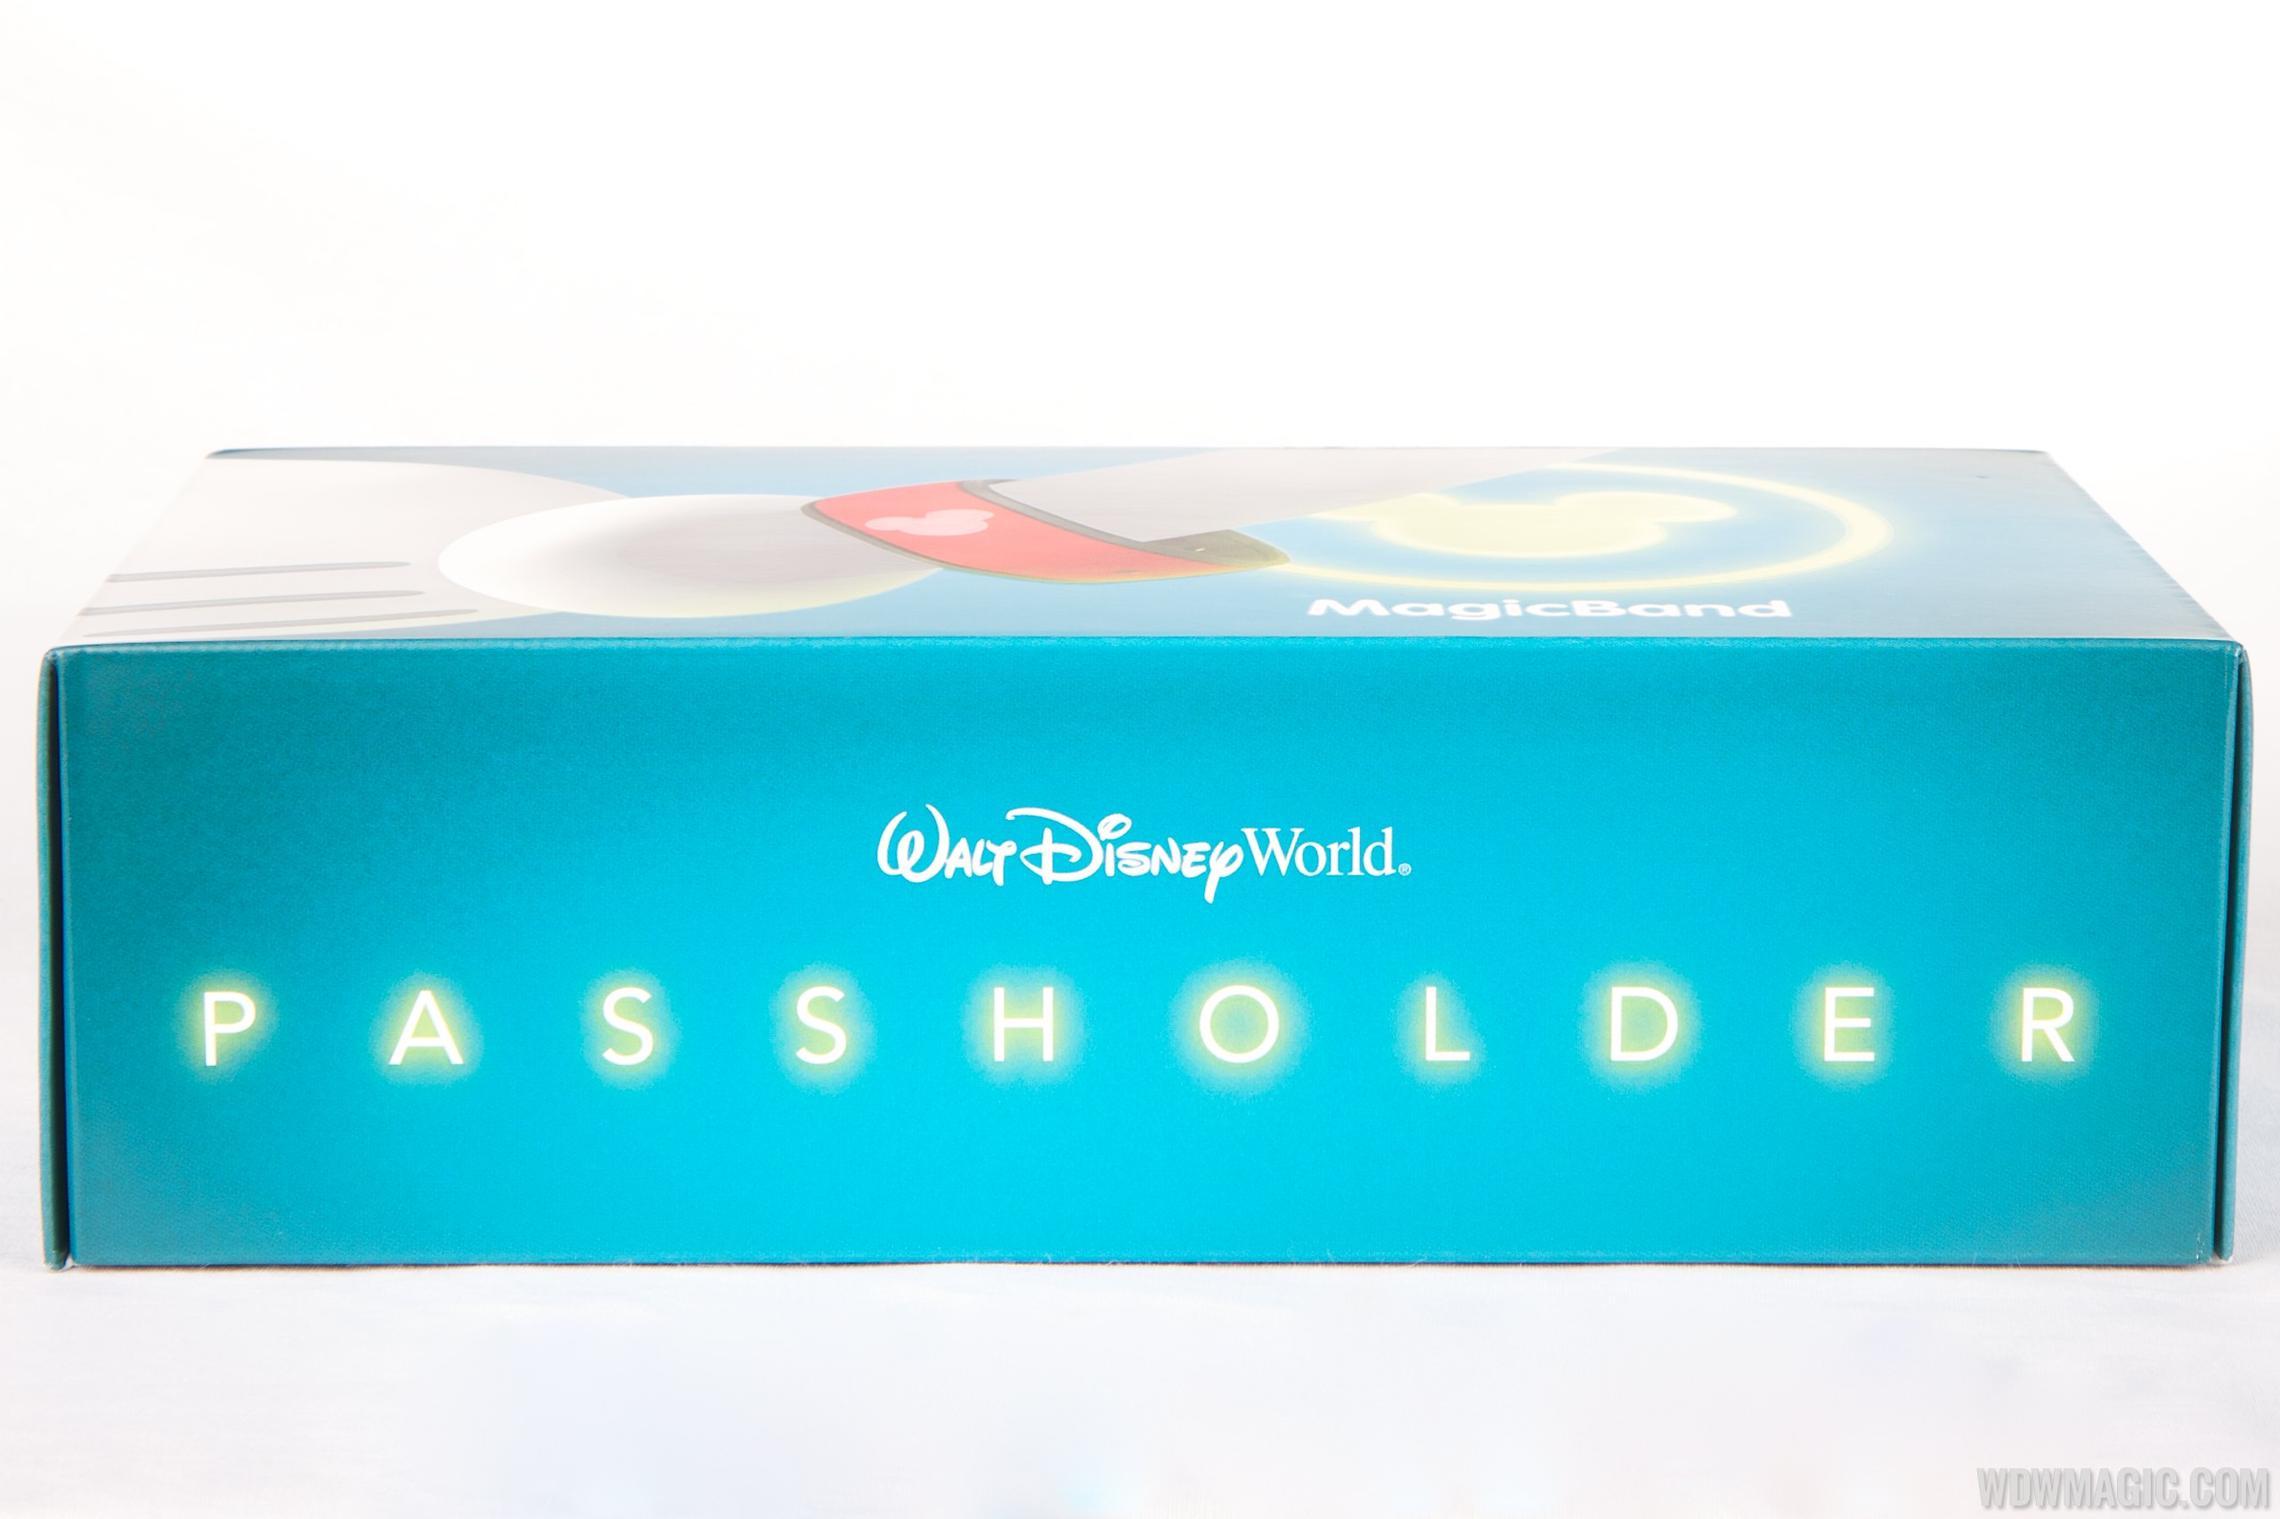 MagicBand passholder box side view